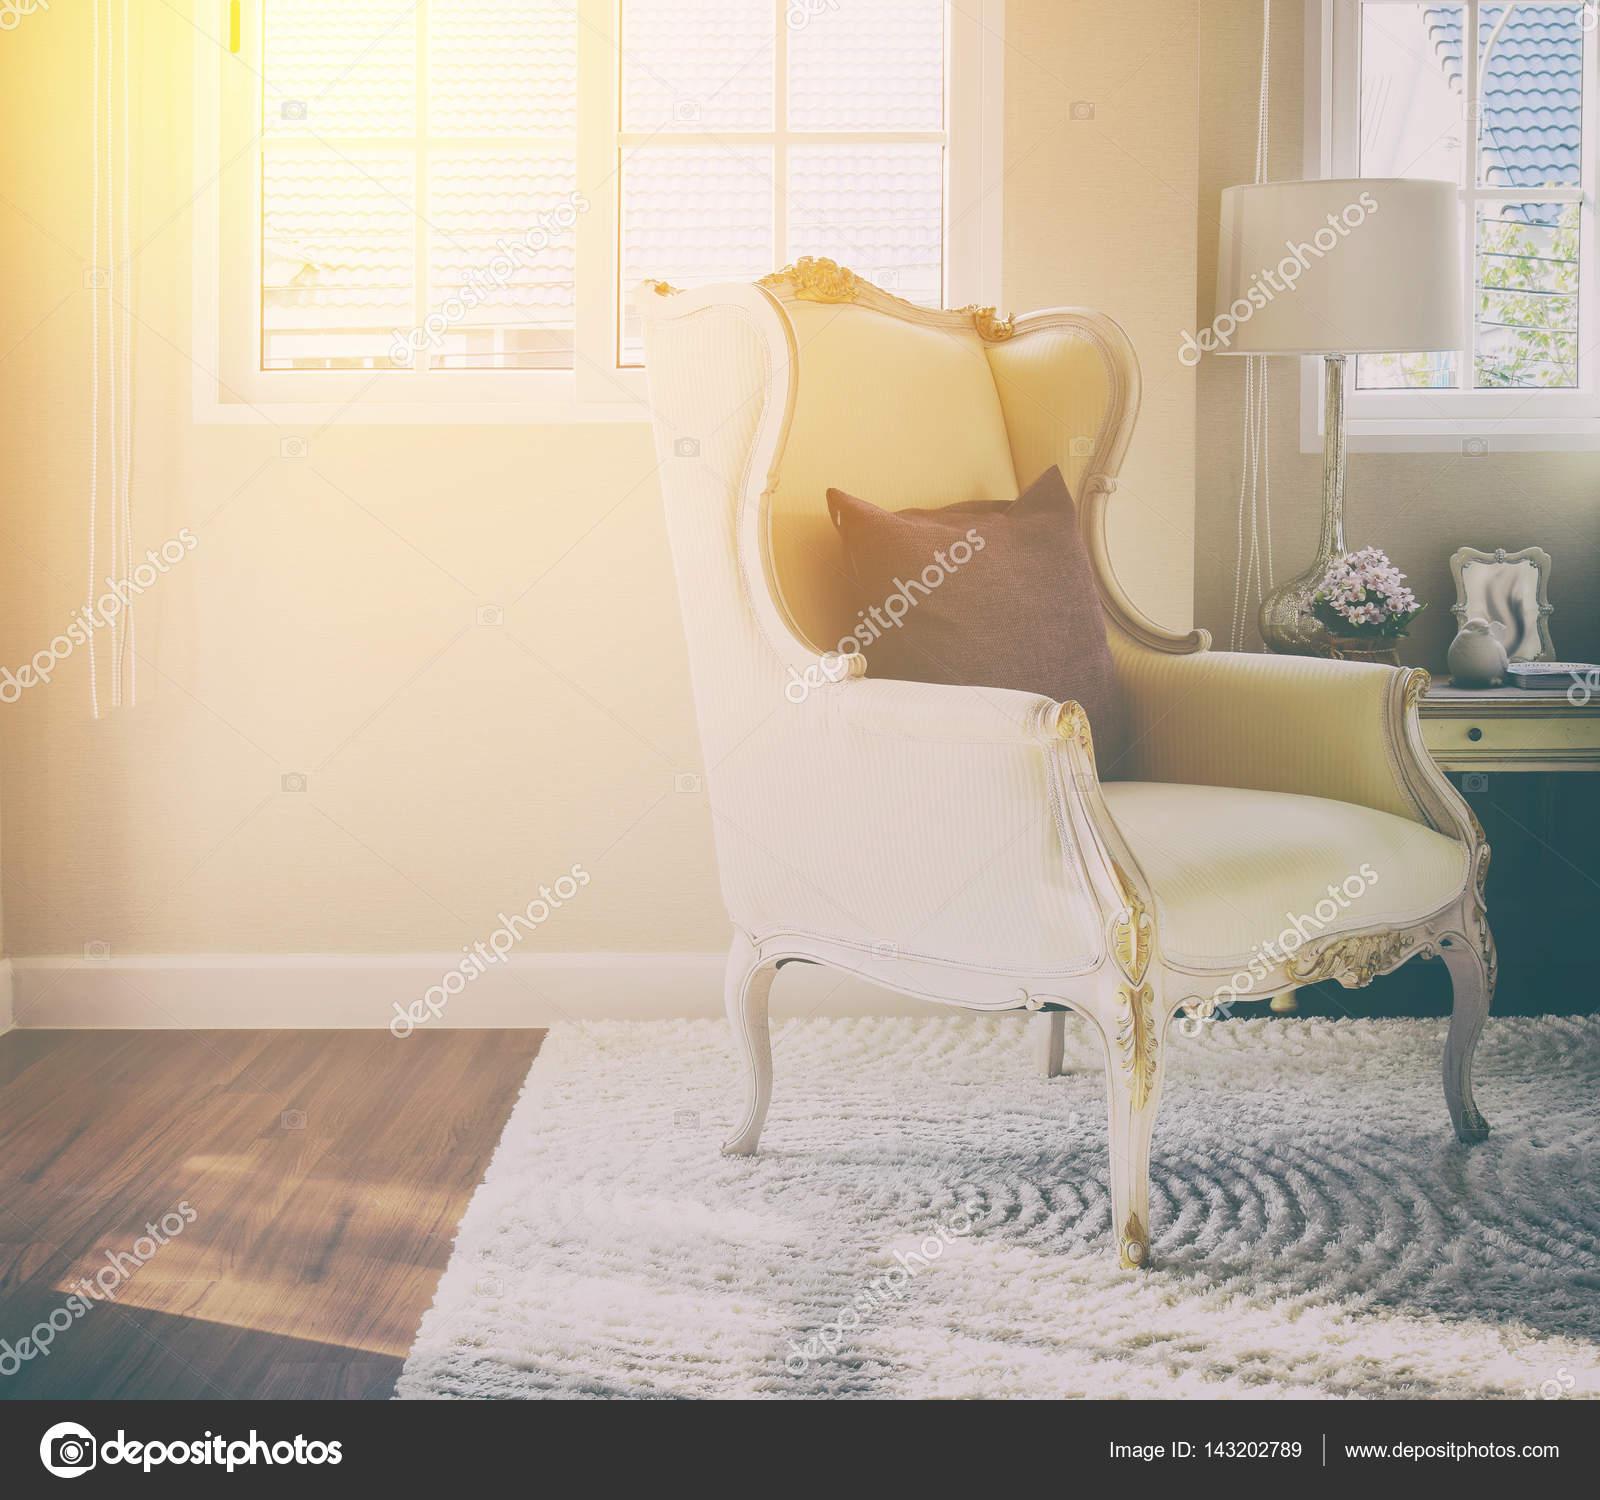 schlafzimmer vintage stil bettdecken qvc test dieler schlafsofas bis 200 forster lattenroste. Black Bedroom Furniture Sets. Home Design Ideas